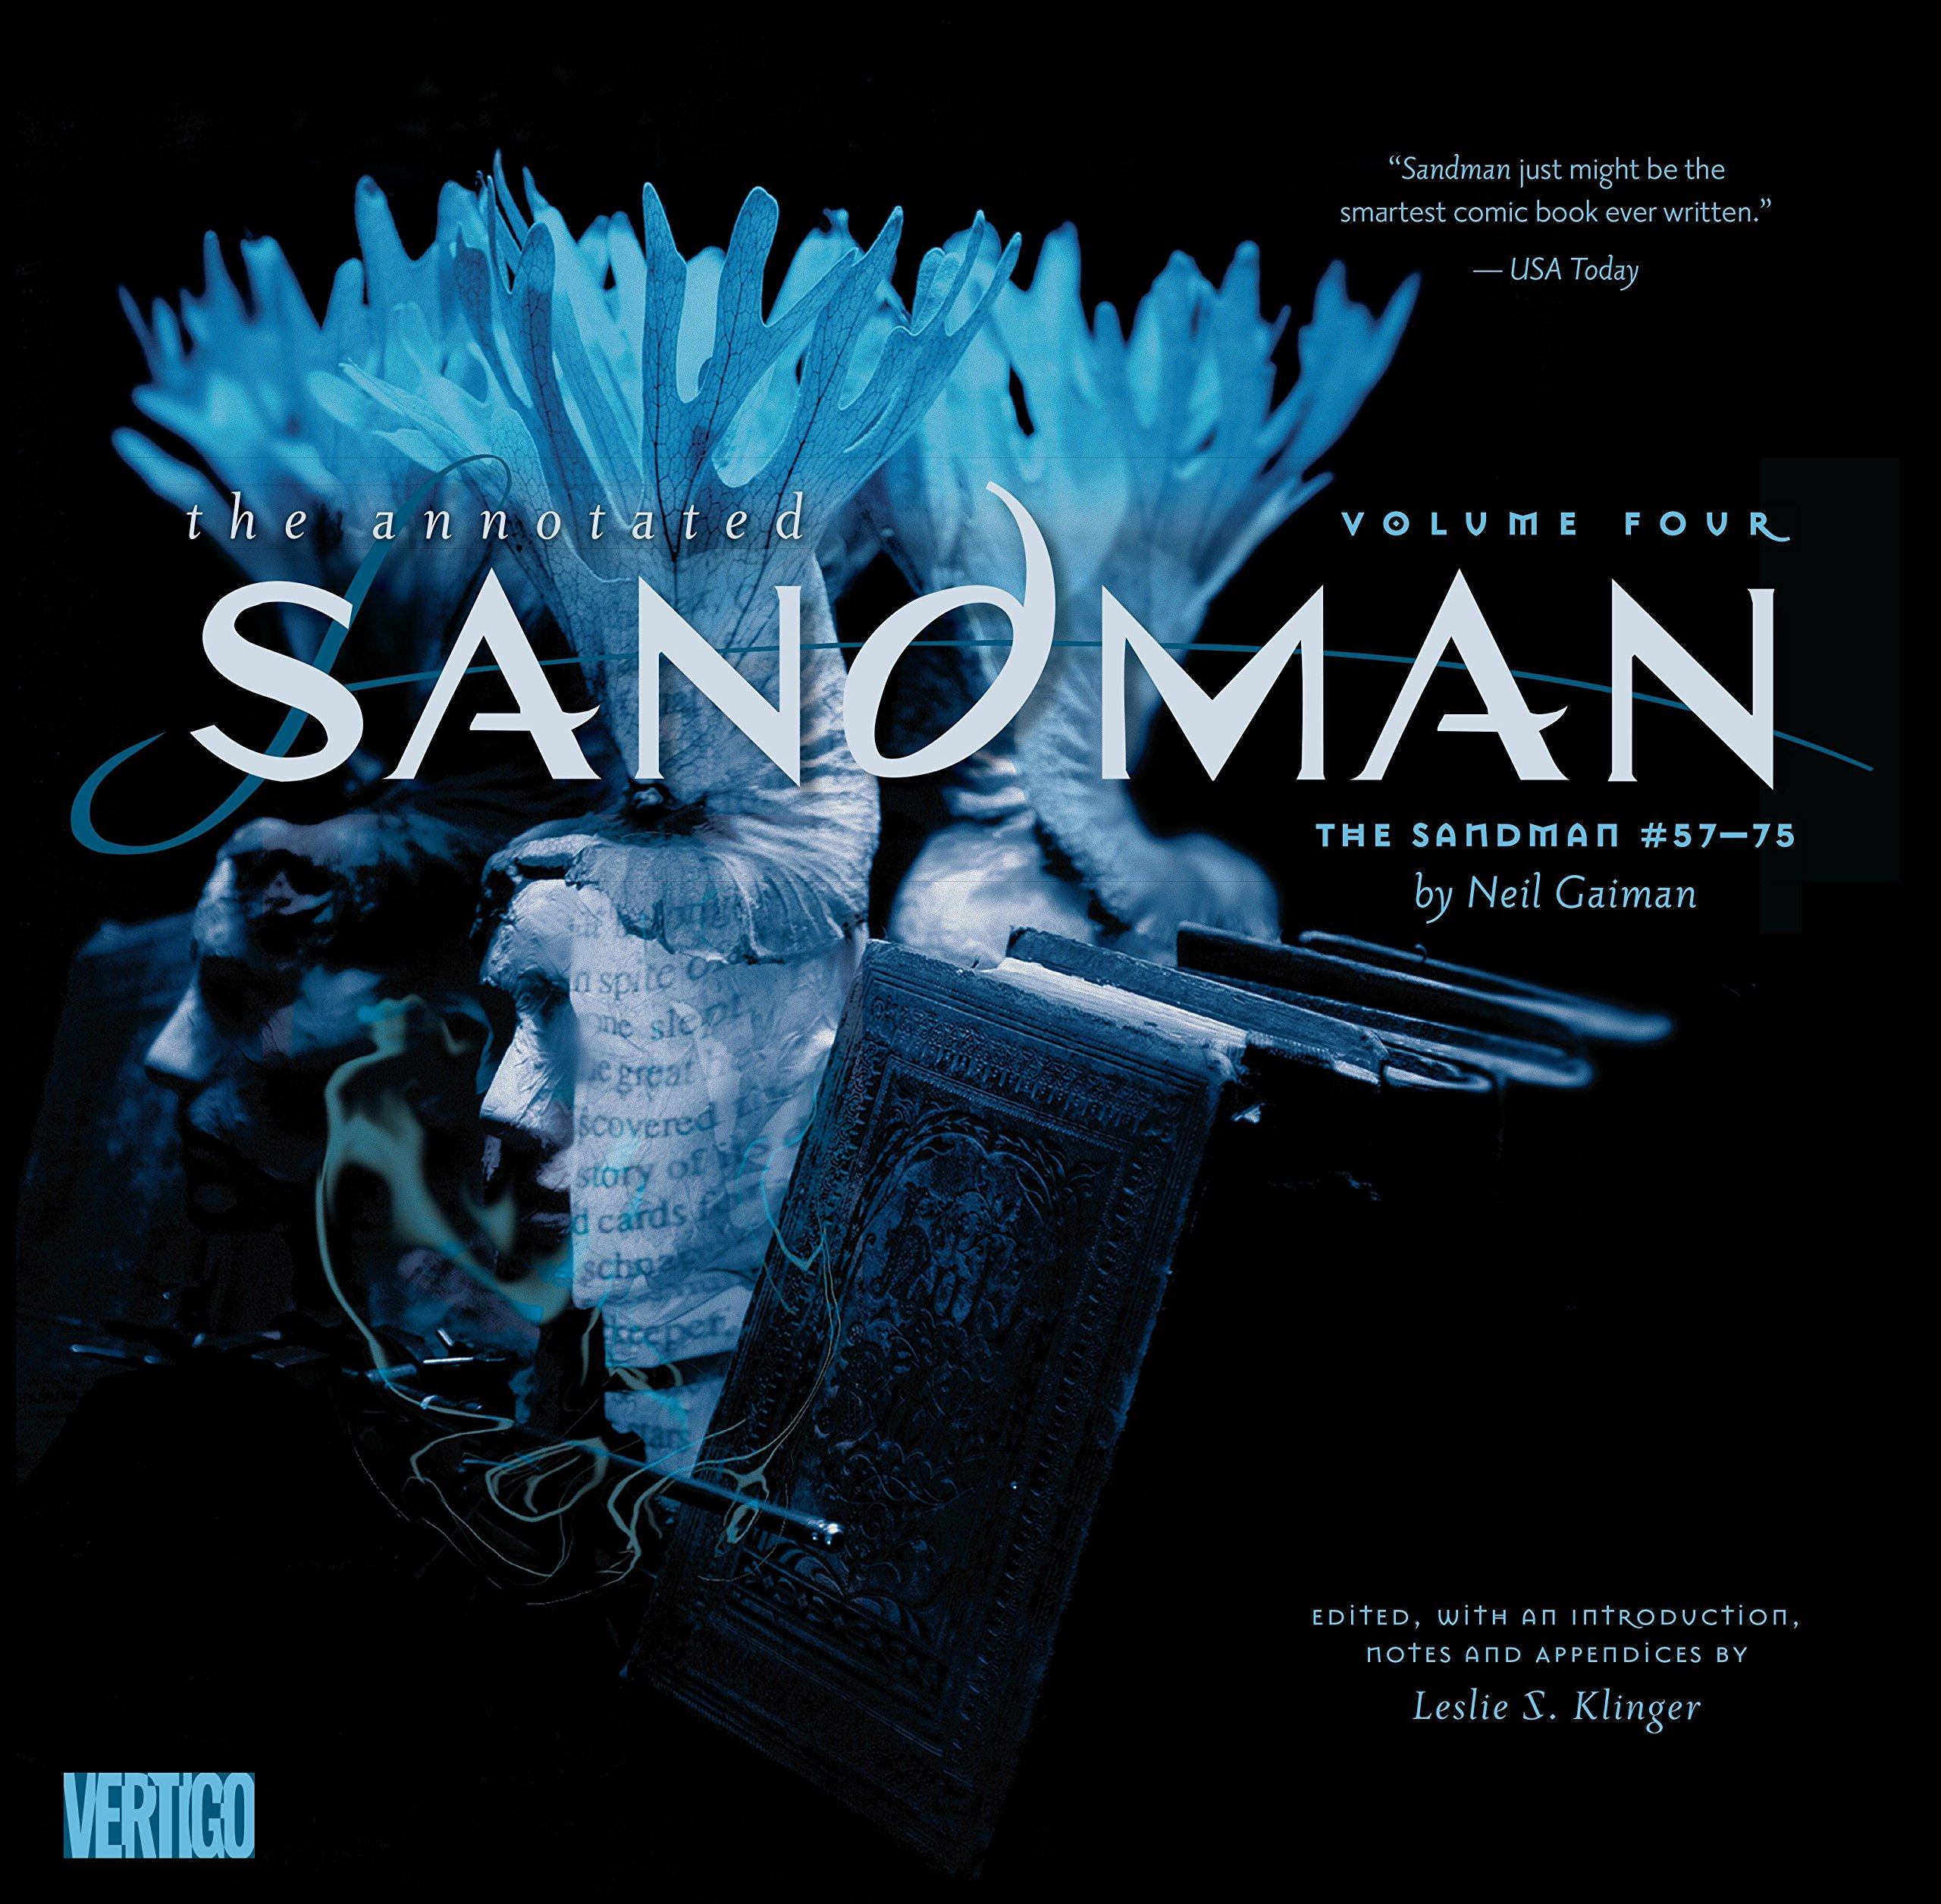 Annotated Sandman Vol. 4: The Sandman #57-75 (The Annotated Sandman) pdf epub